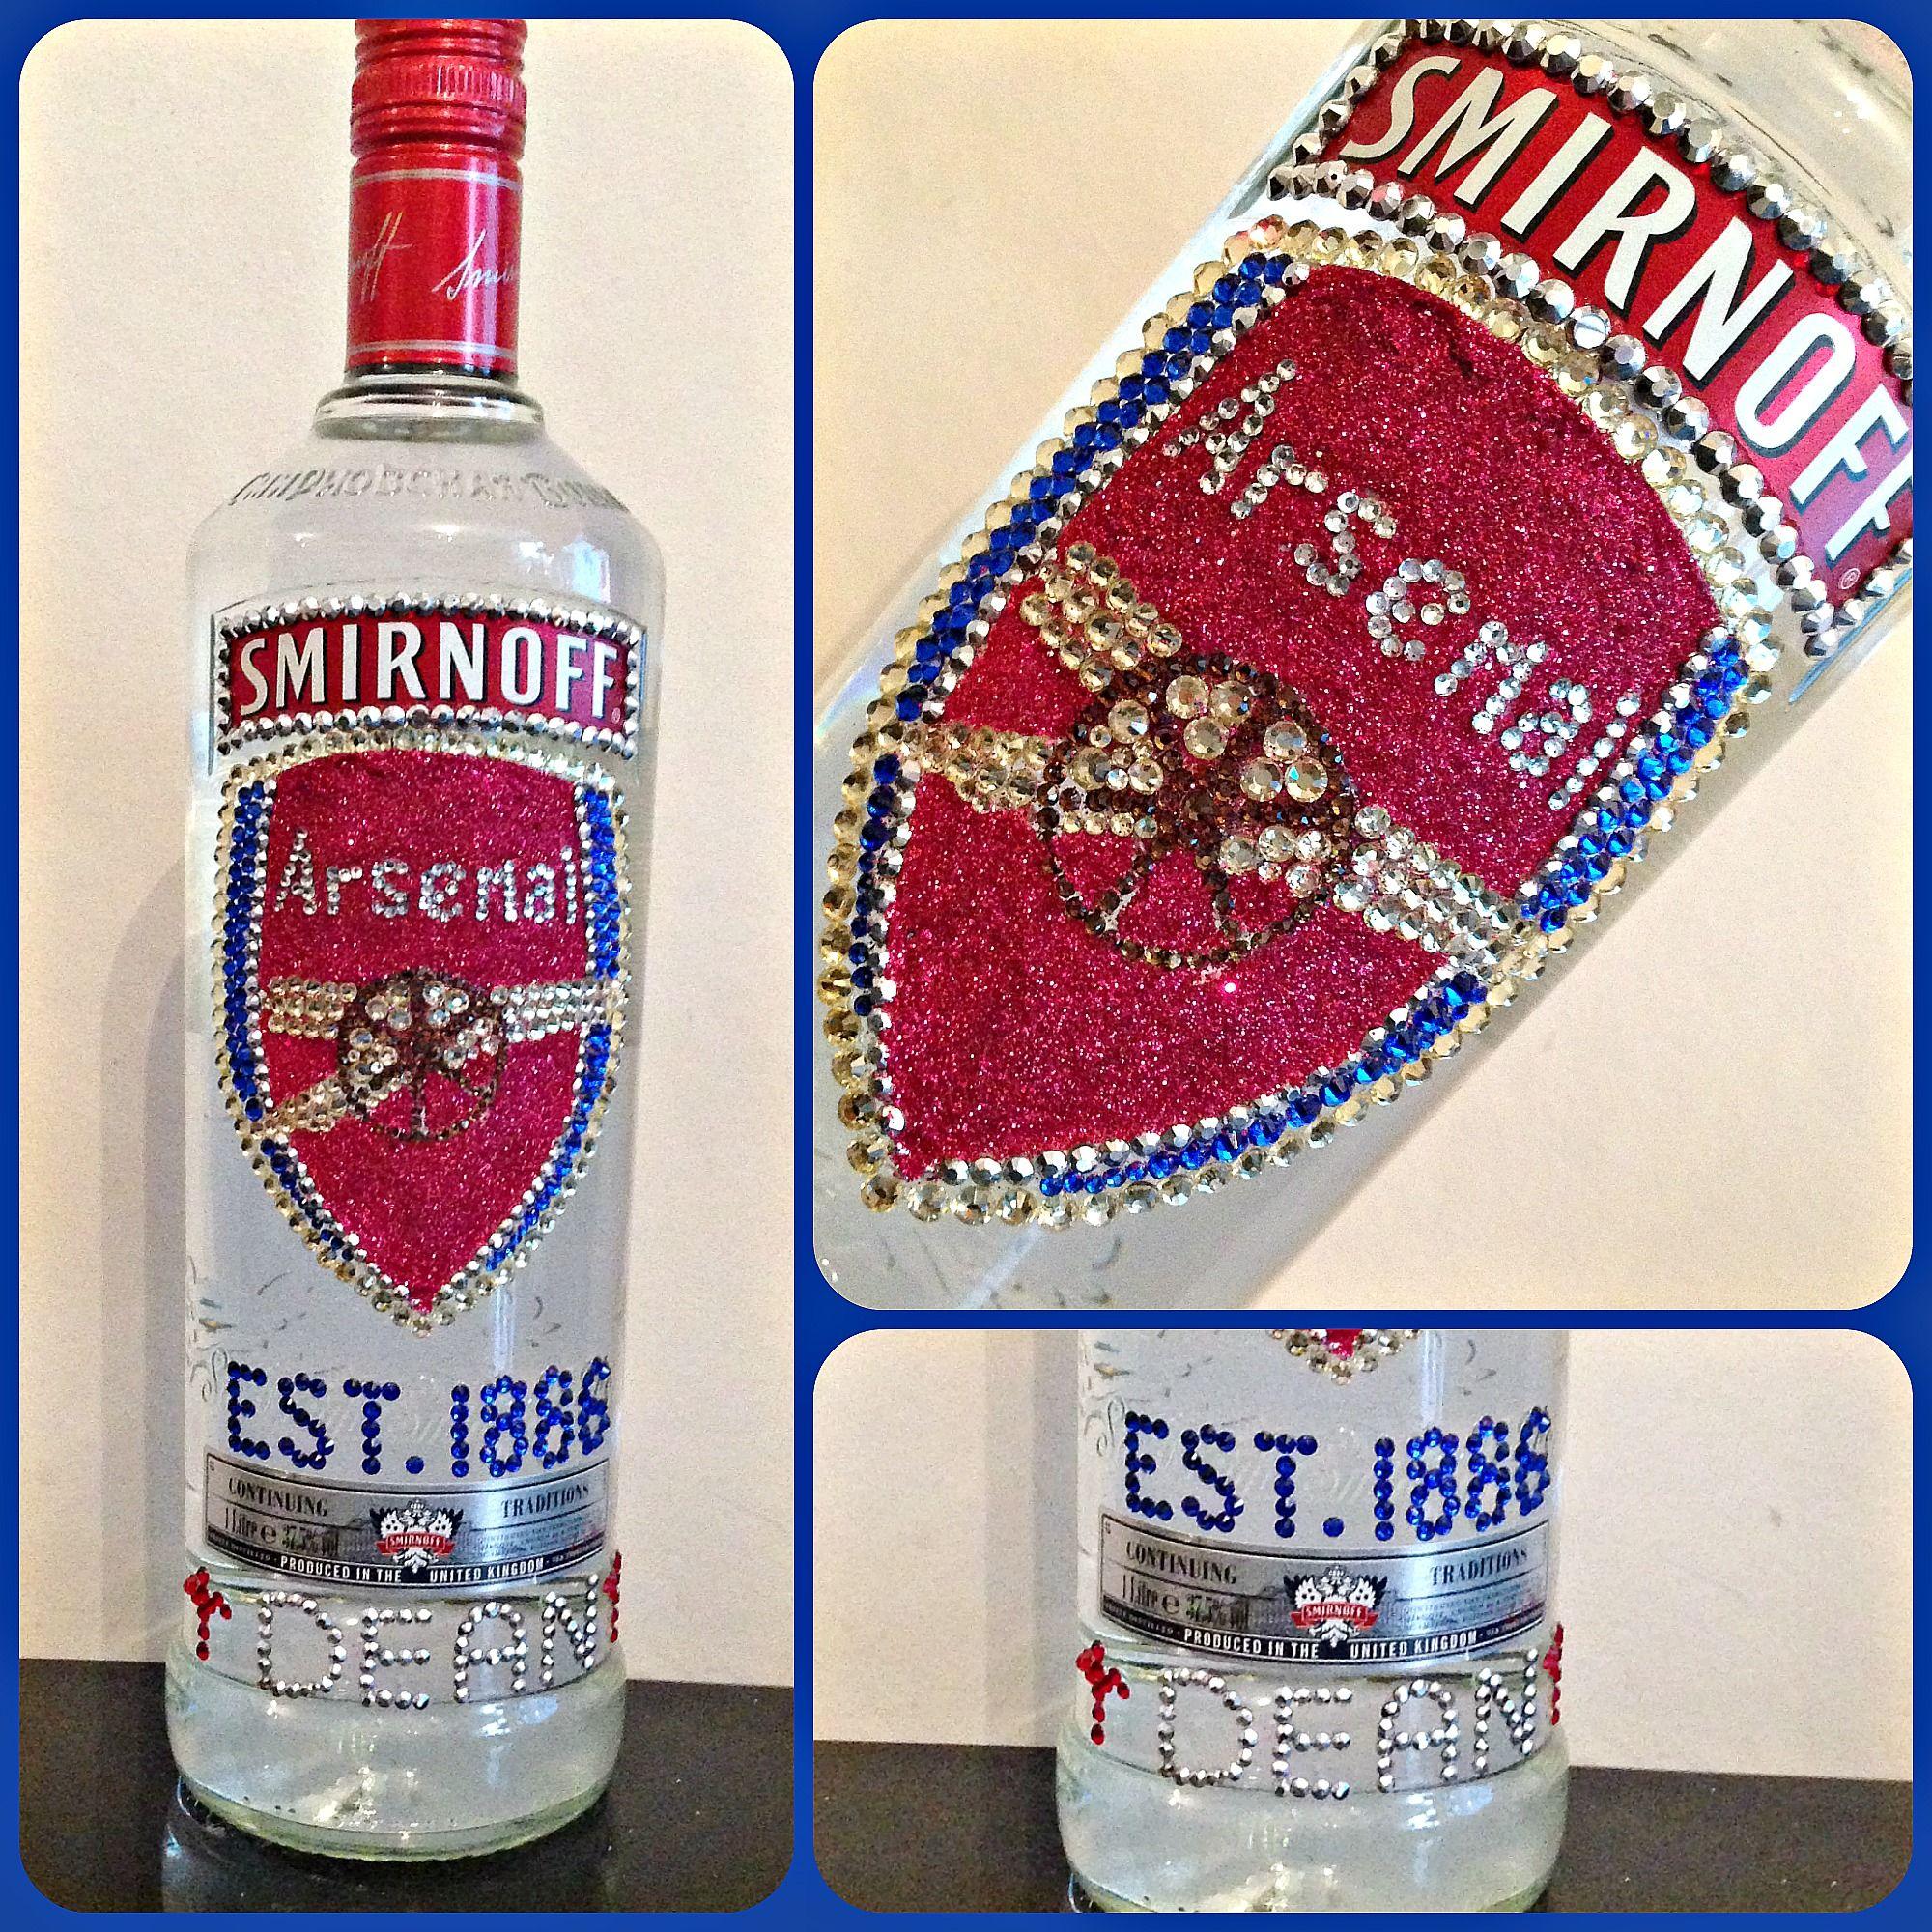 Smirnoff Vodka Bottle Decorated With Various Coloured Crystals And Glitter Arsenal Badge On Bottle Made For Dean Bling Bottles Bottle Crafts Bottles Decoration